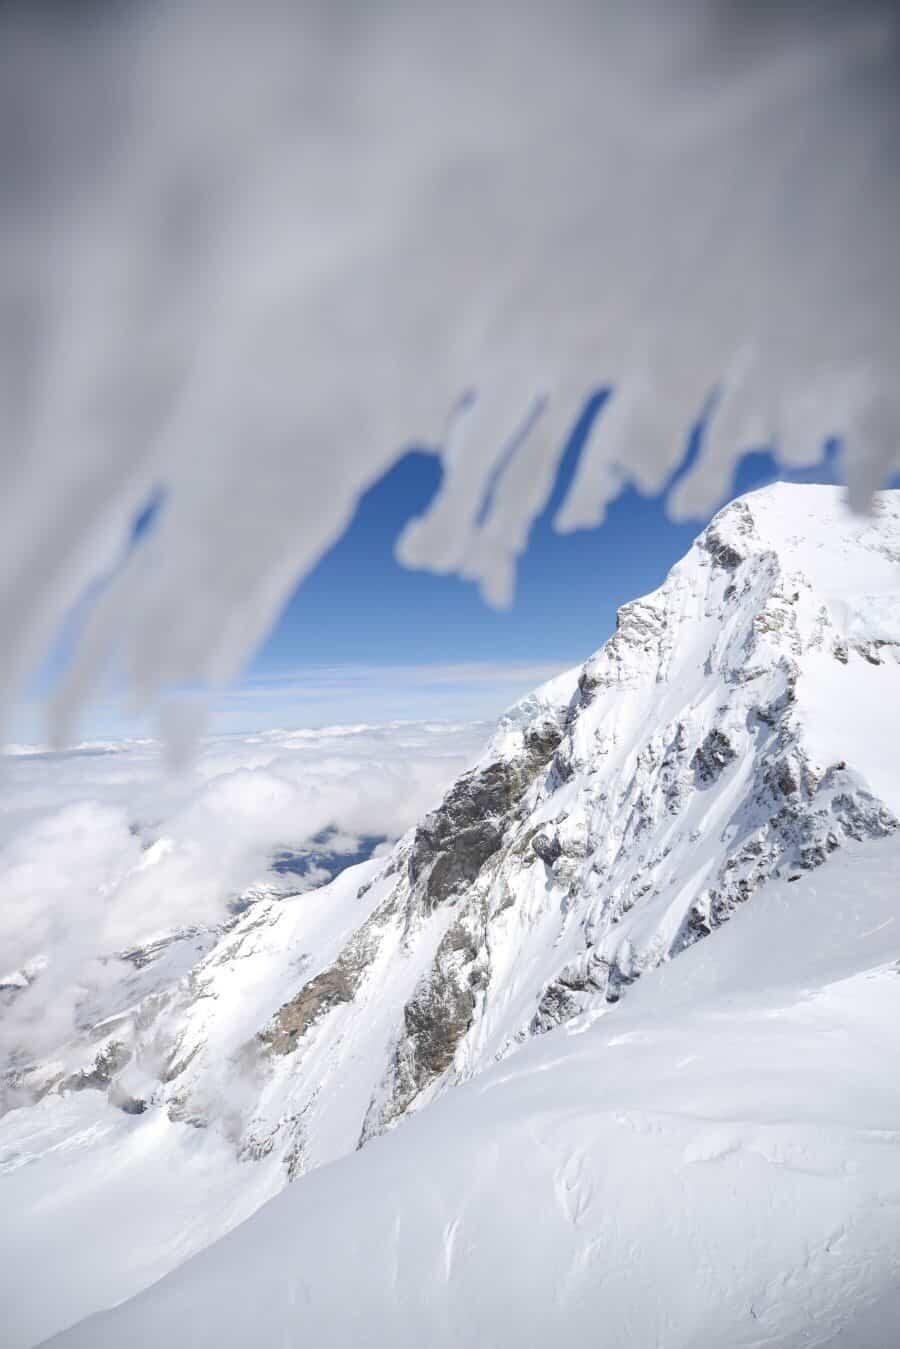 Jungfrau photography locations, switzerland